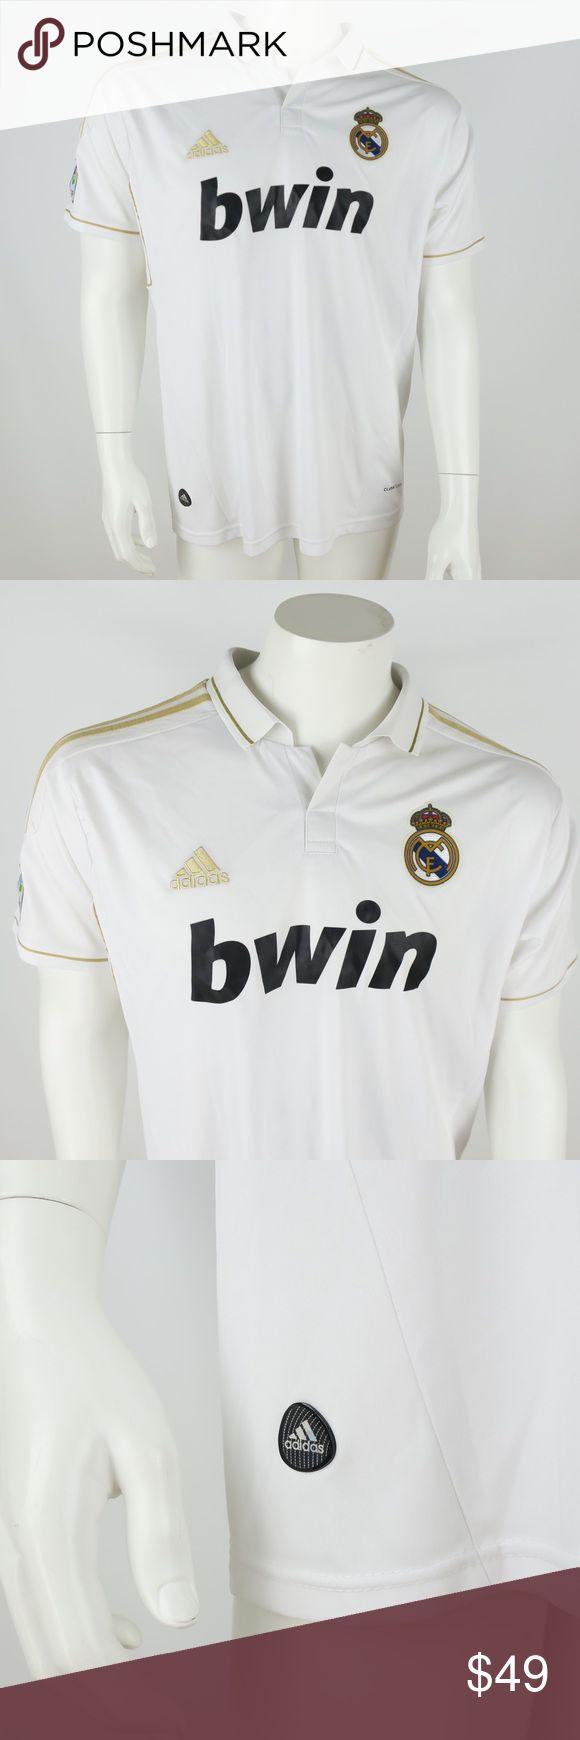 camiseta real madrid adizero y climacool